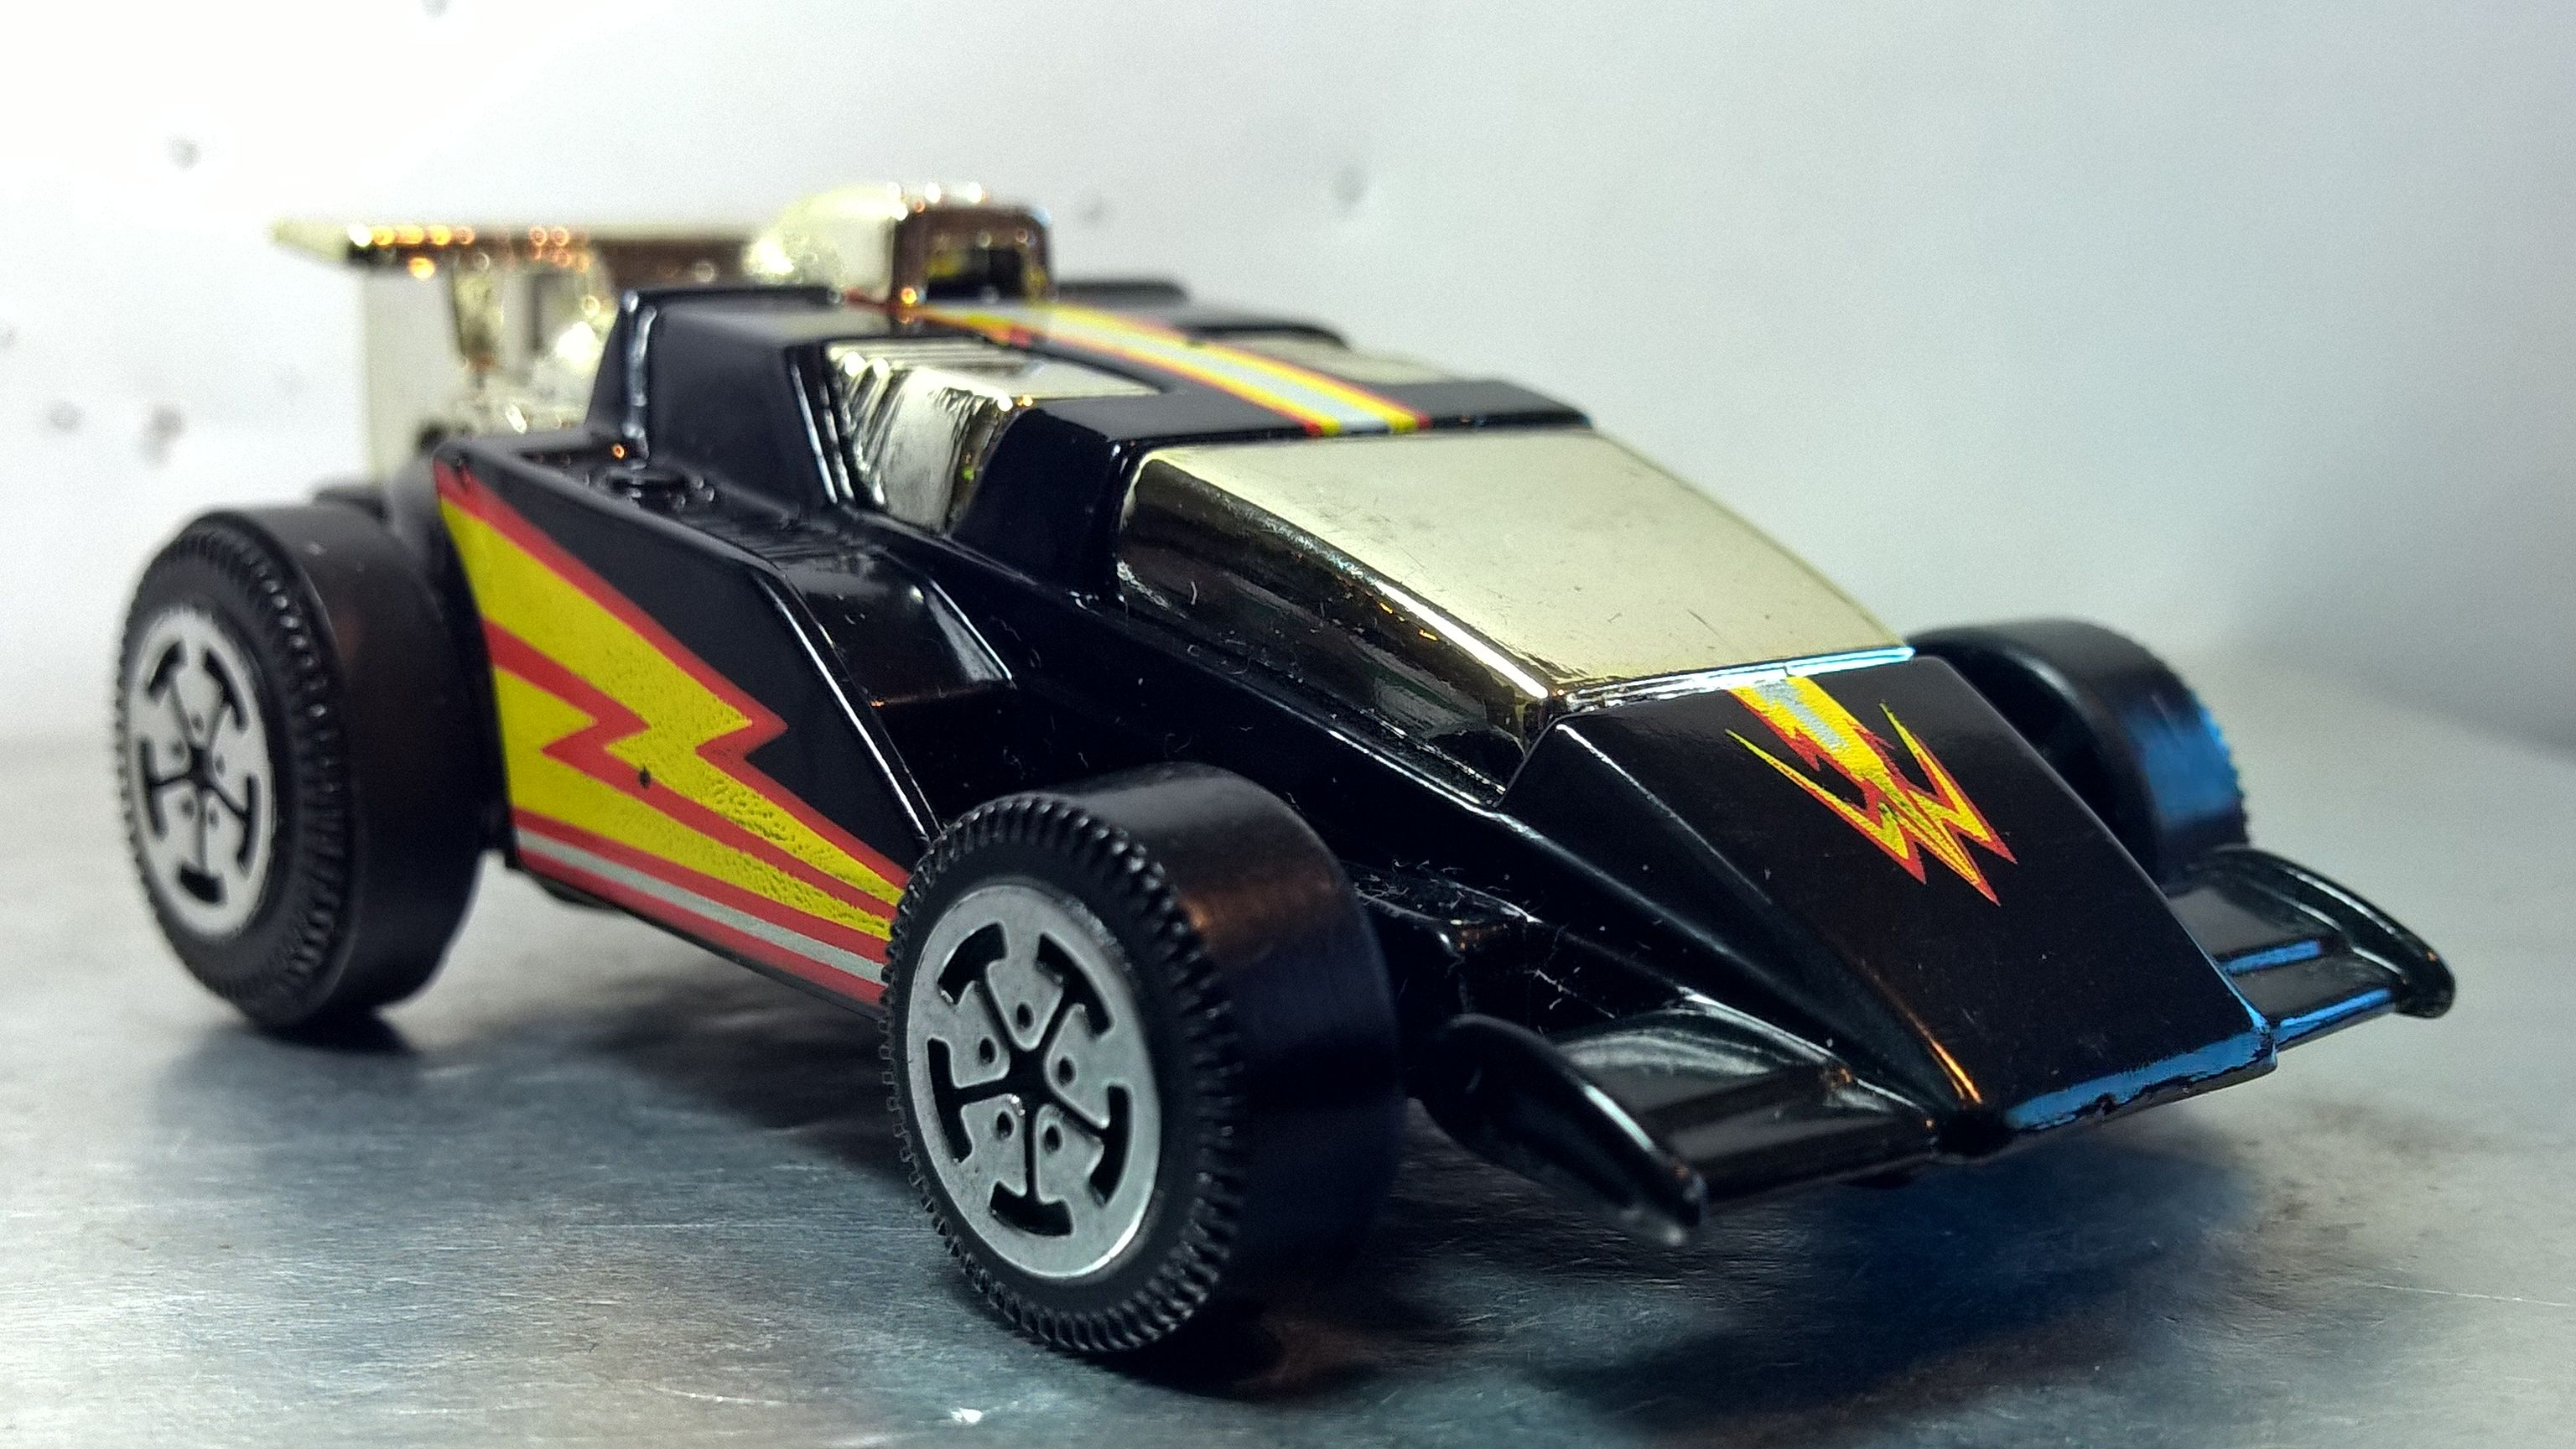 Hot Wheels XV RACERS 1985 17 Hot wheels, Car photos